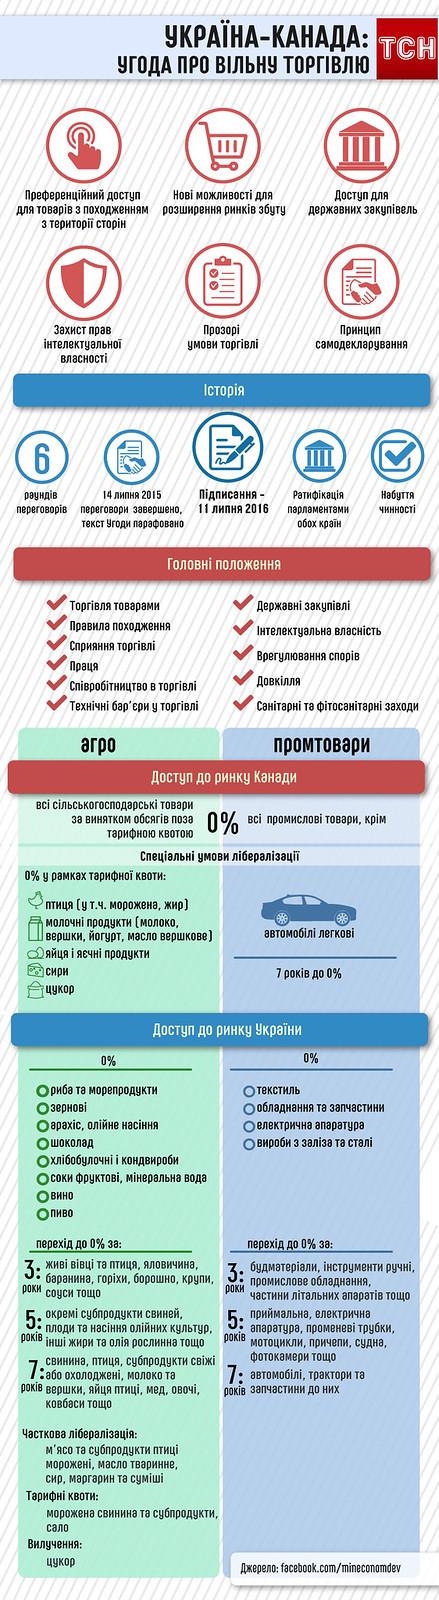 угода Україна-Канада